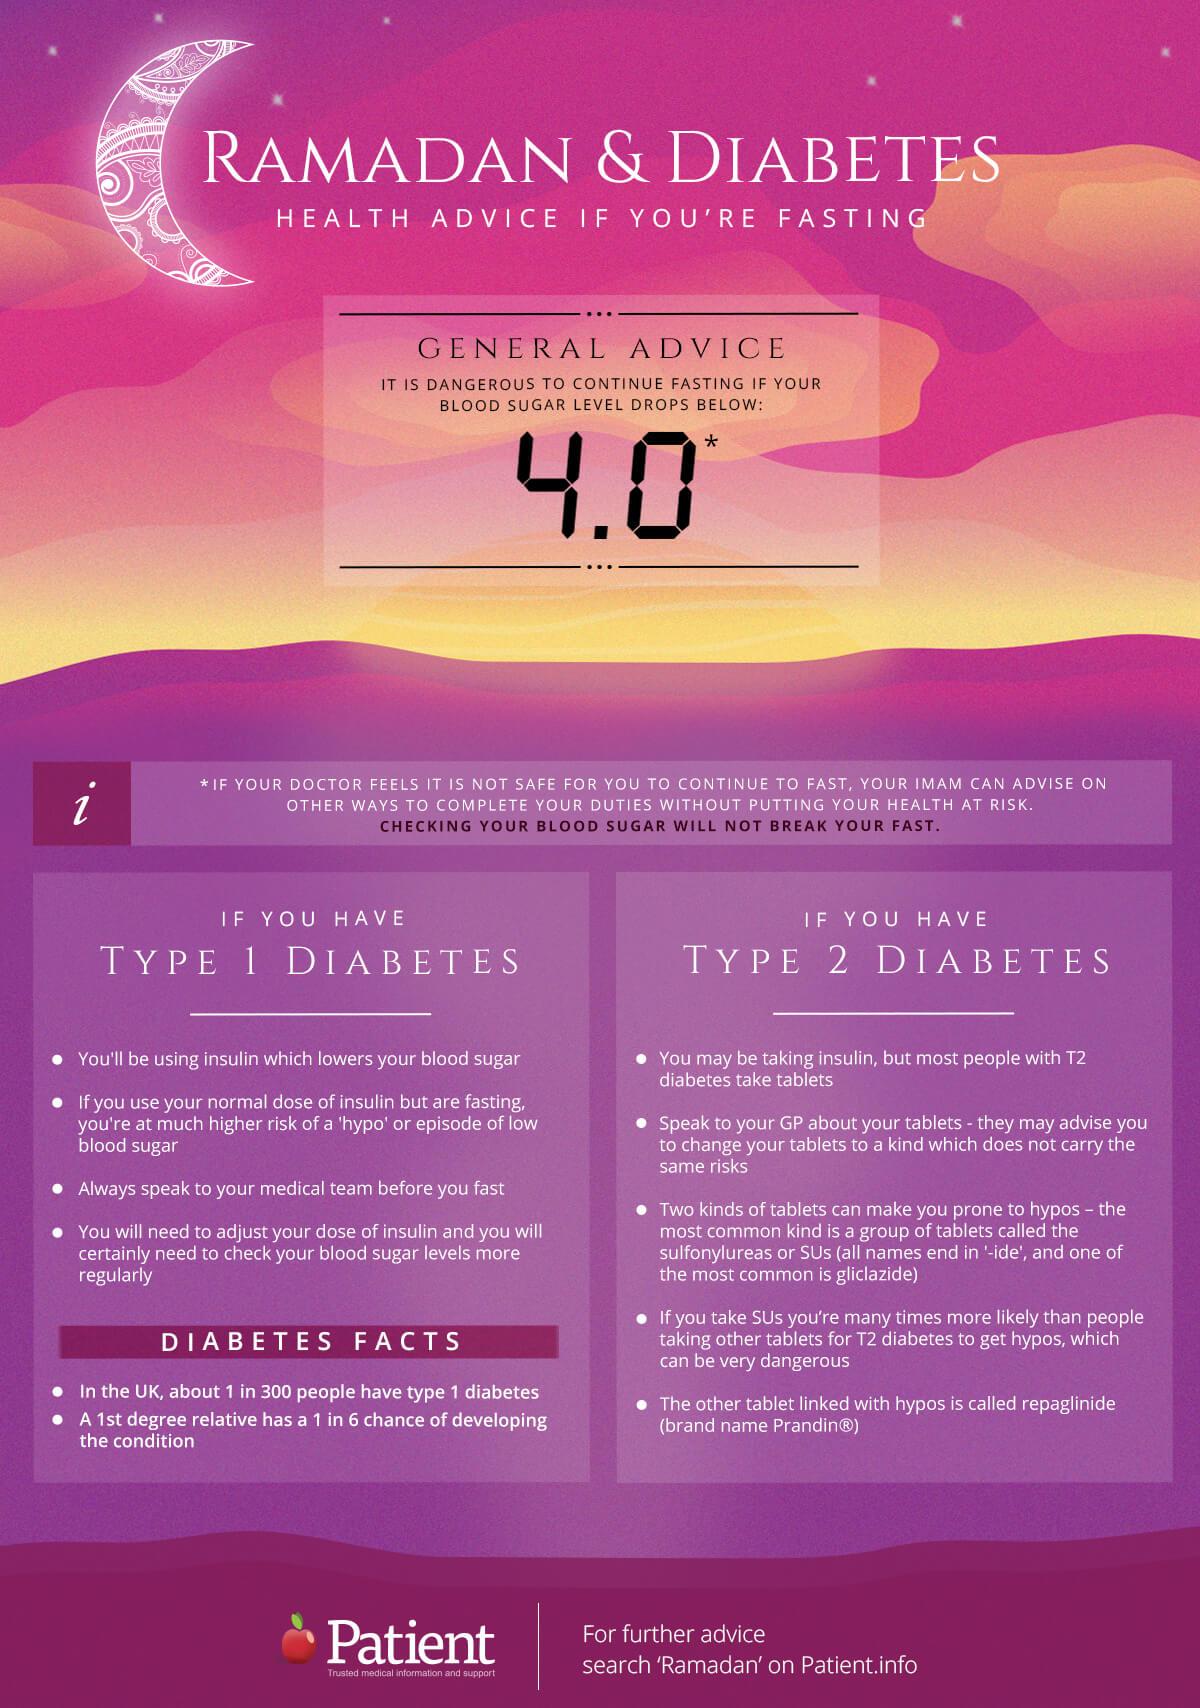 ramadan and diabetes infographic